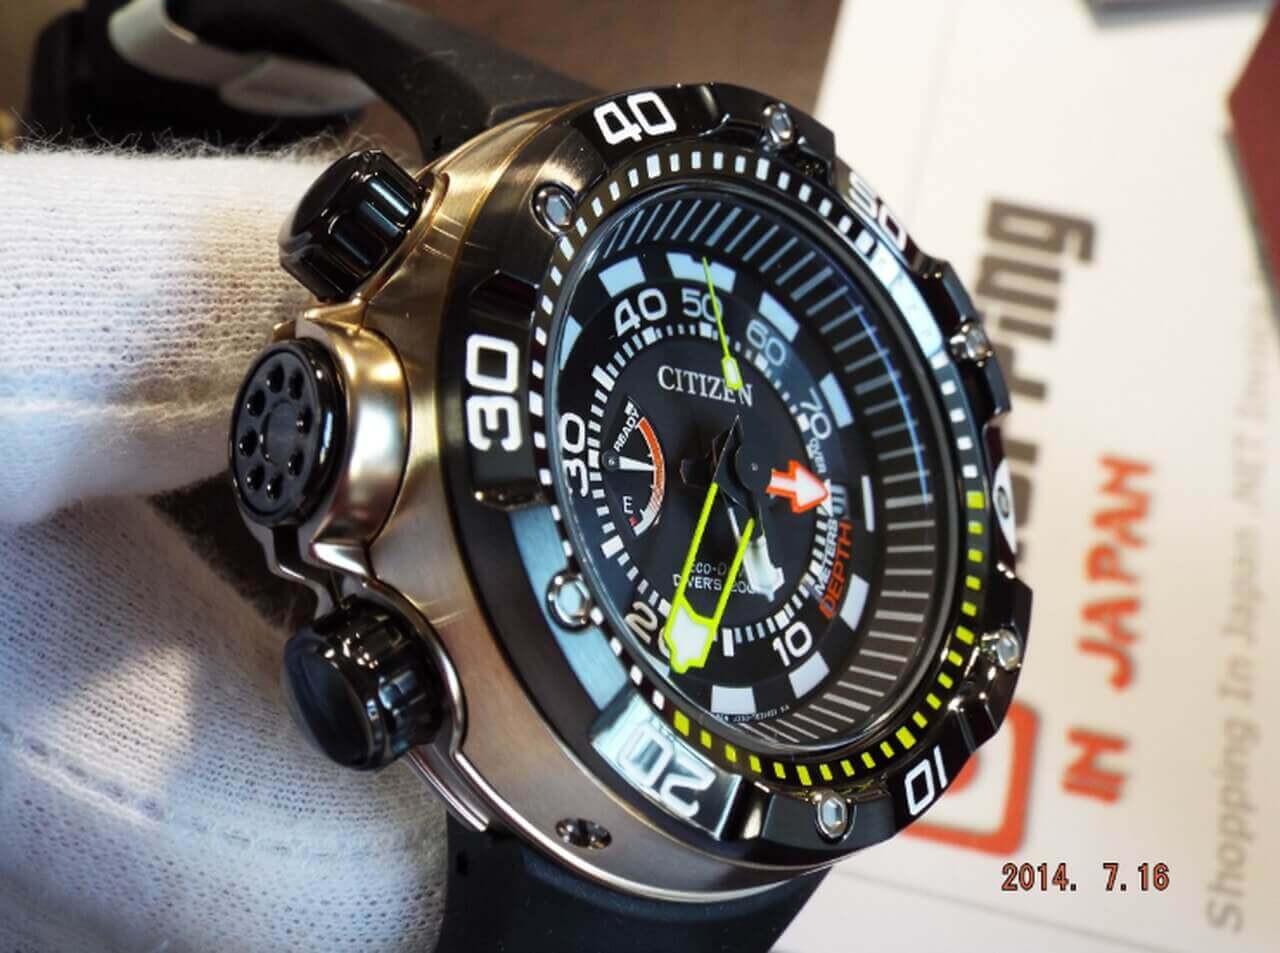 Promaster Aqualand BN2025-02E